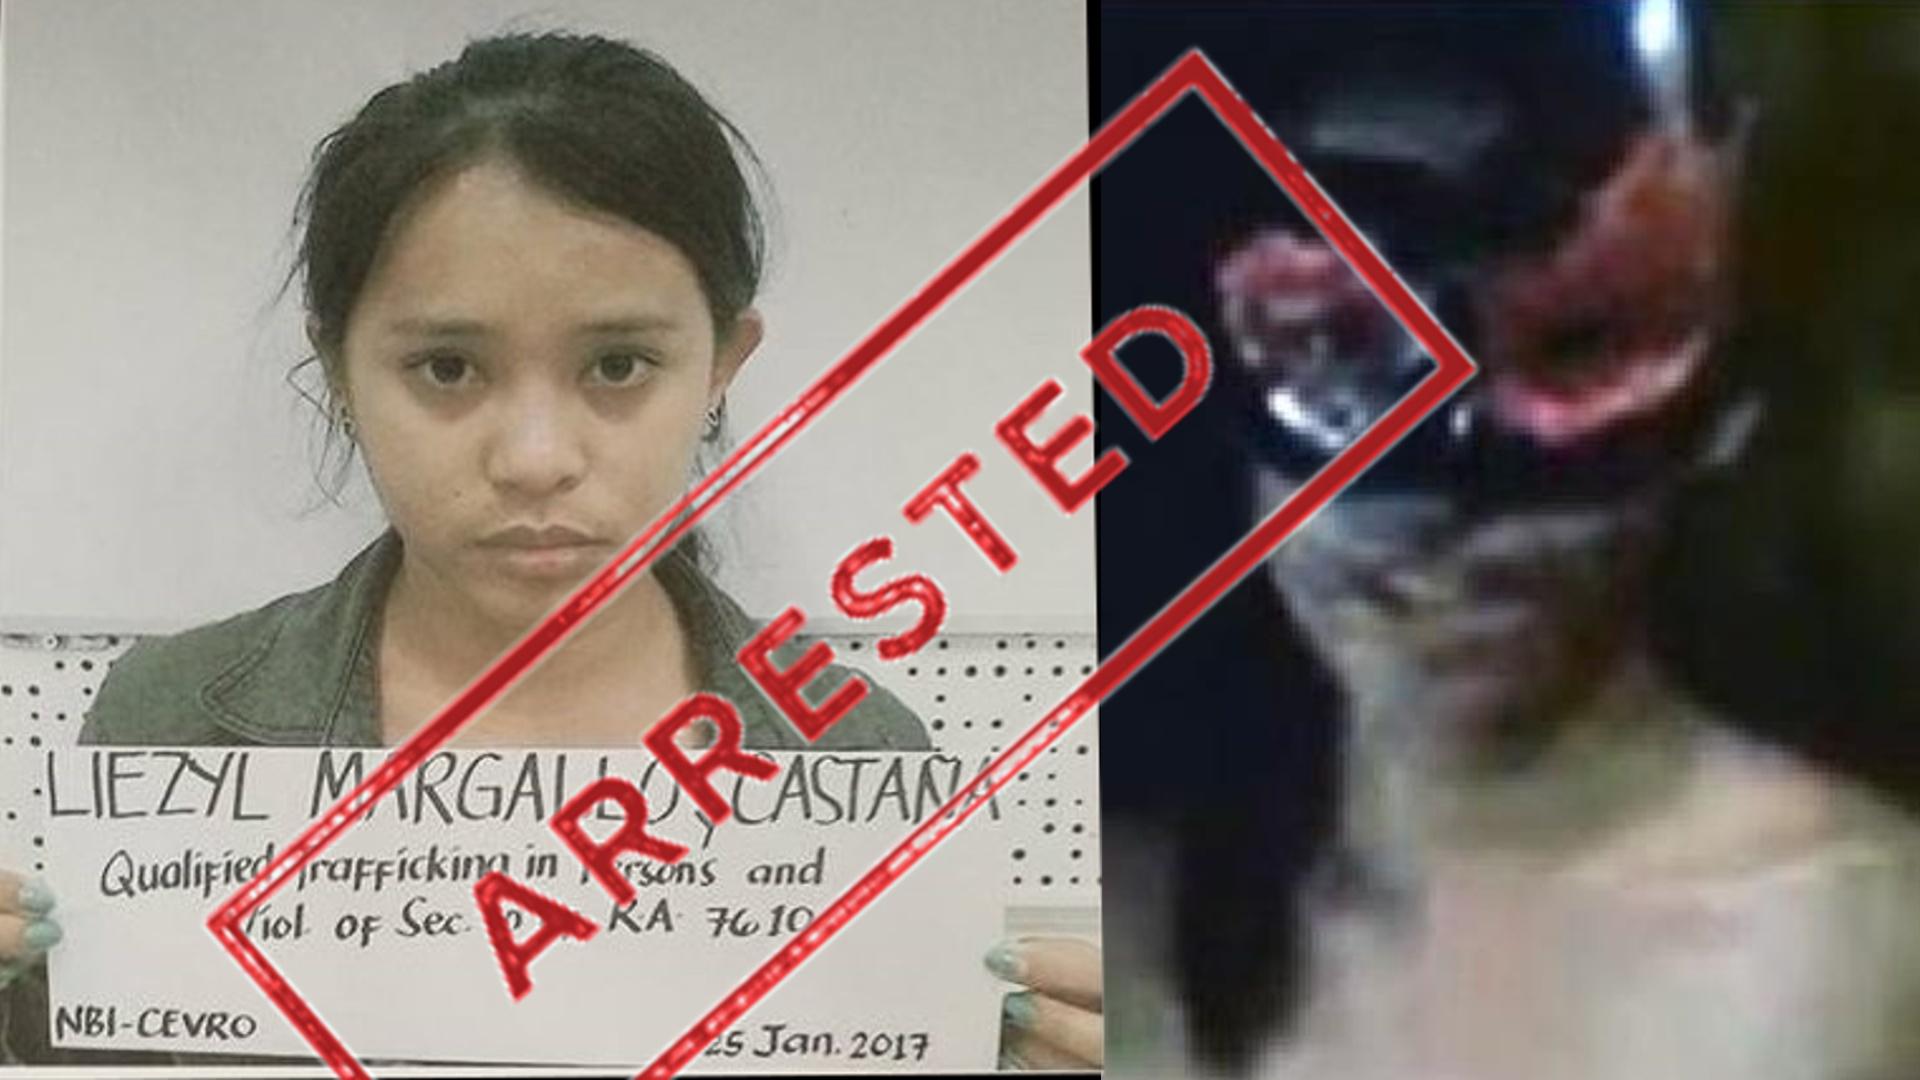 daisy destruction s masked girl arrested news from deep